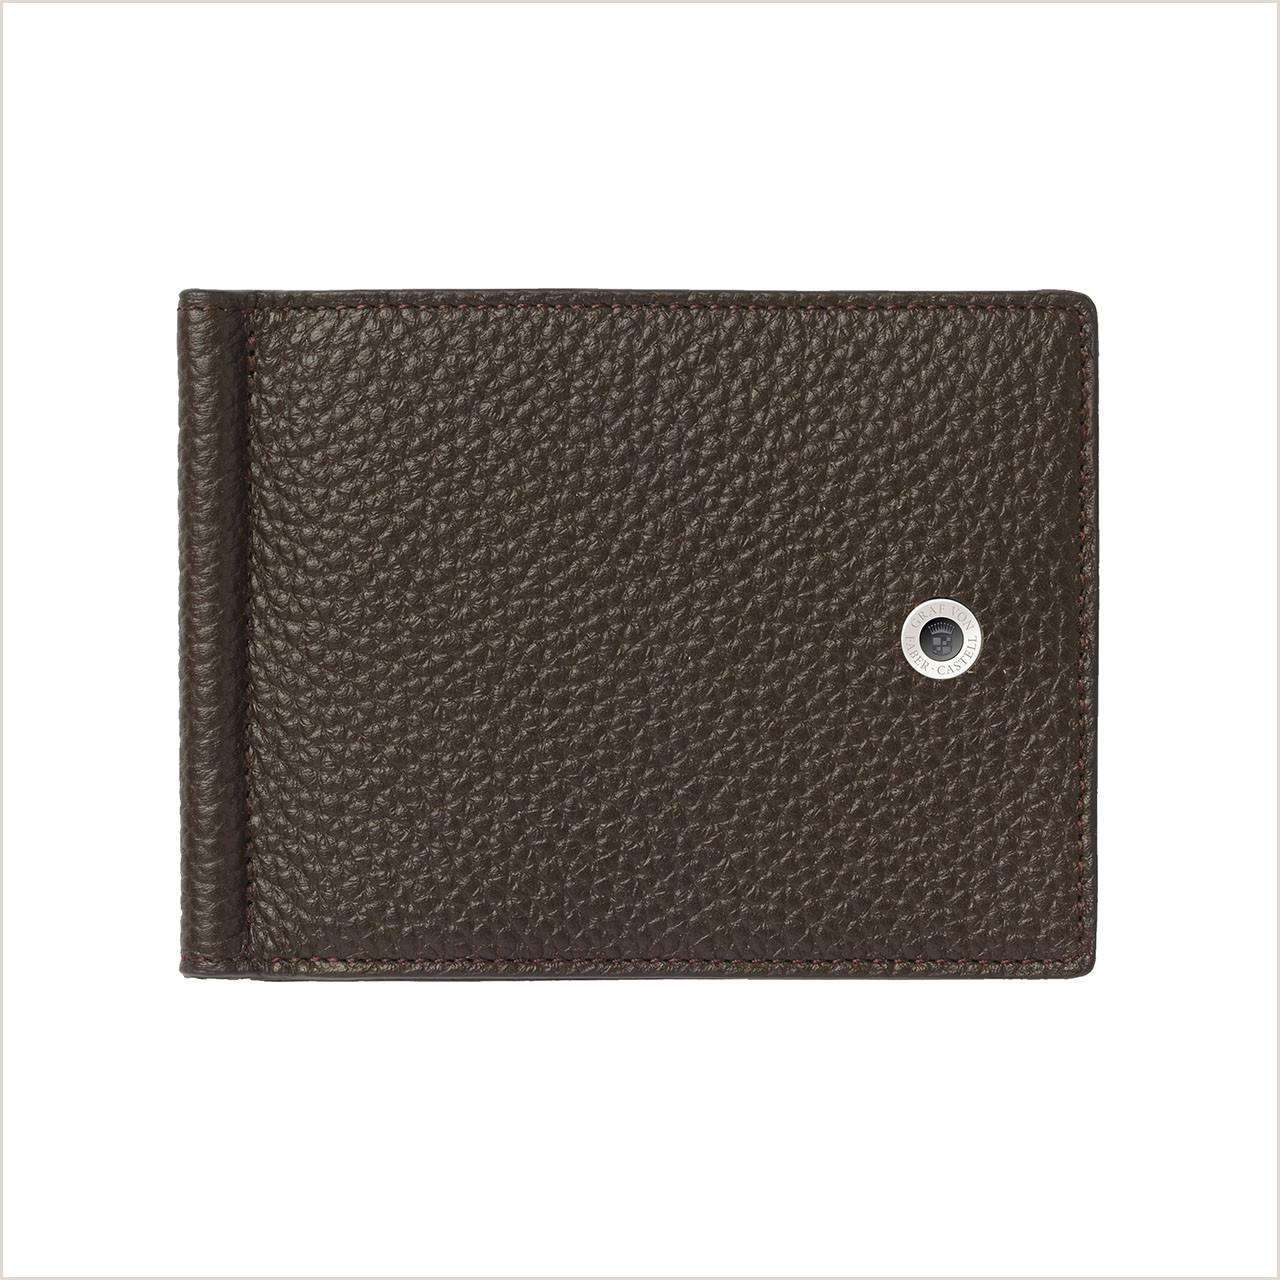 Buisness Card Examples Card Case Money Clip Dark Brown